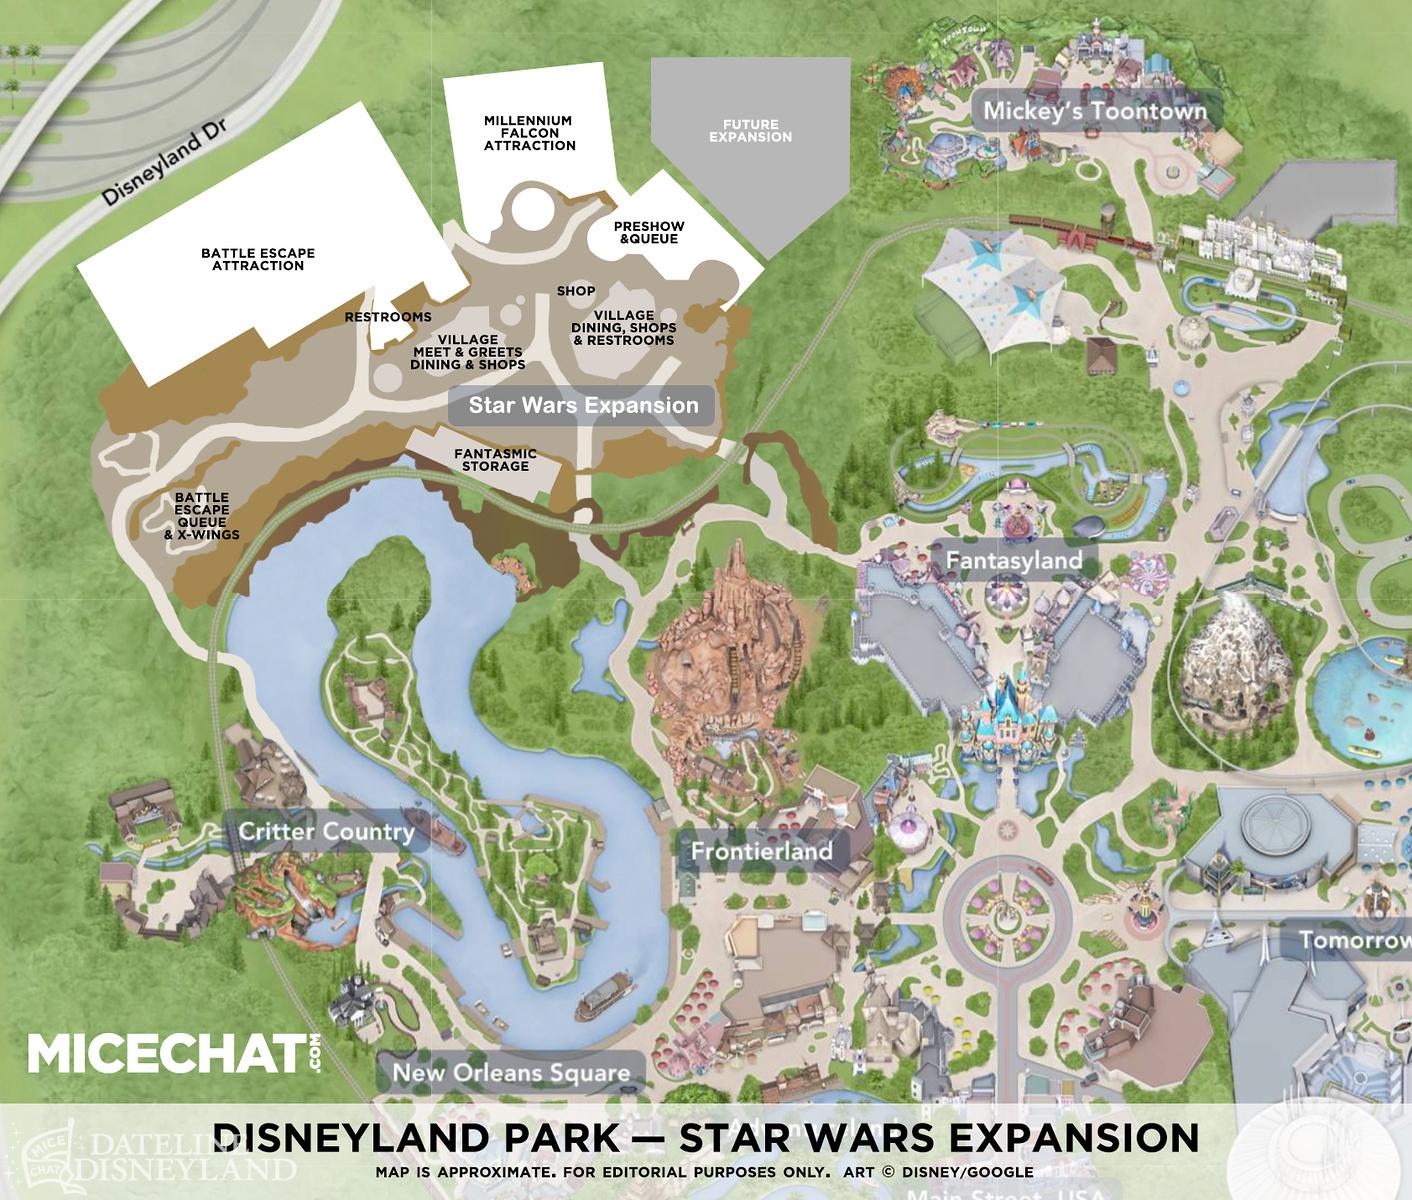 MiceChat Disneyland Resort Features Star Wars Land News - Disneyland usa location map